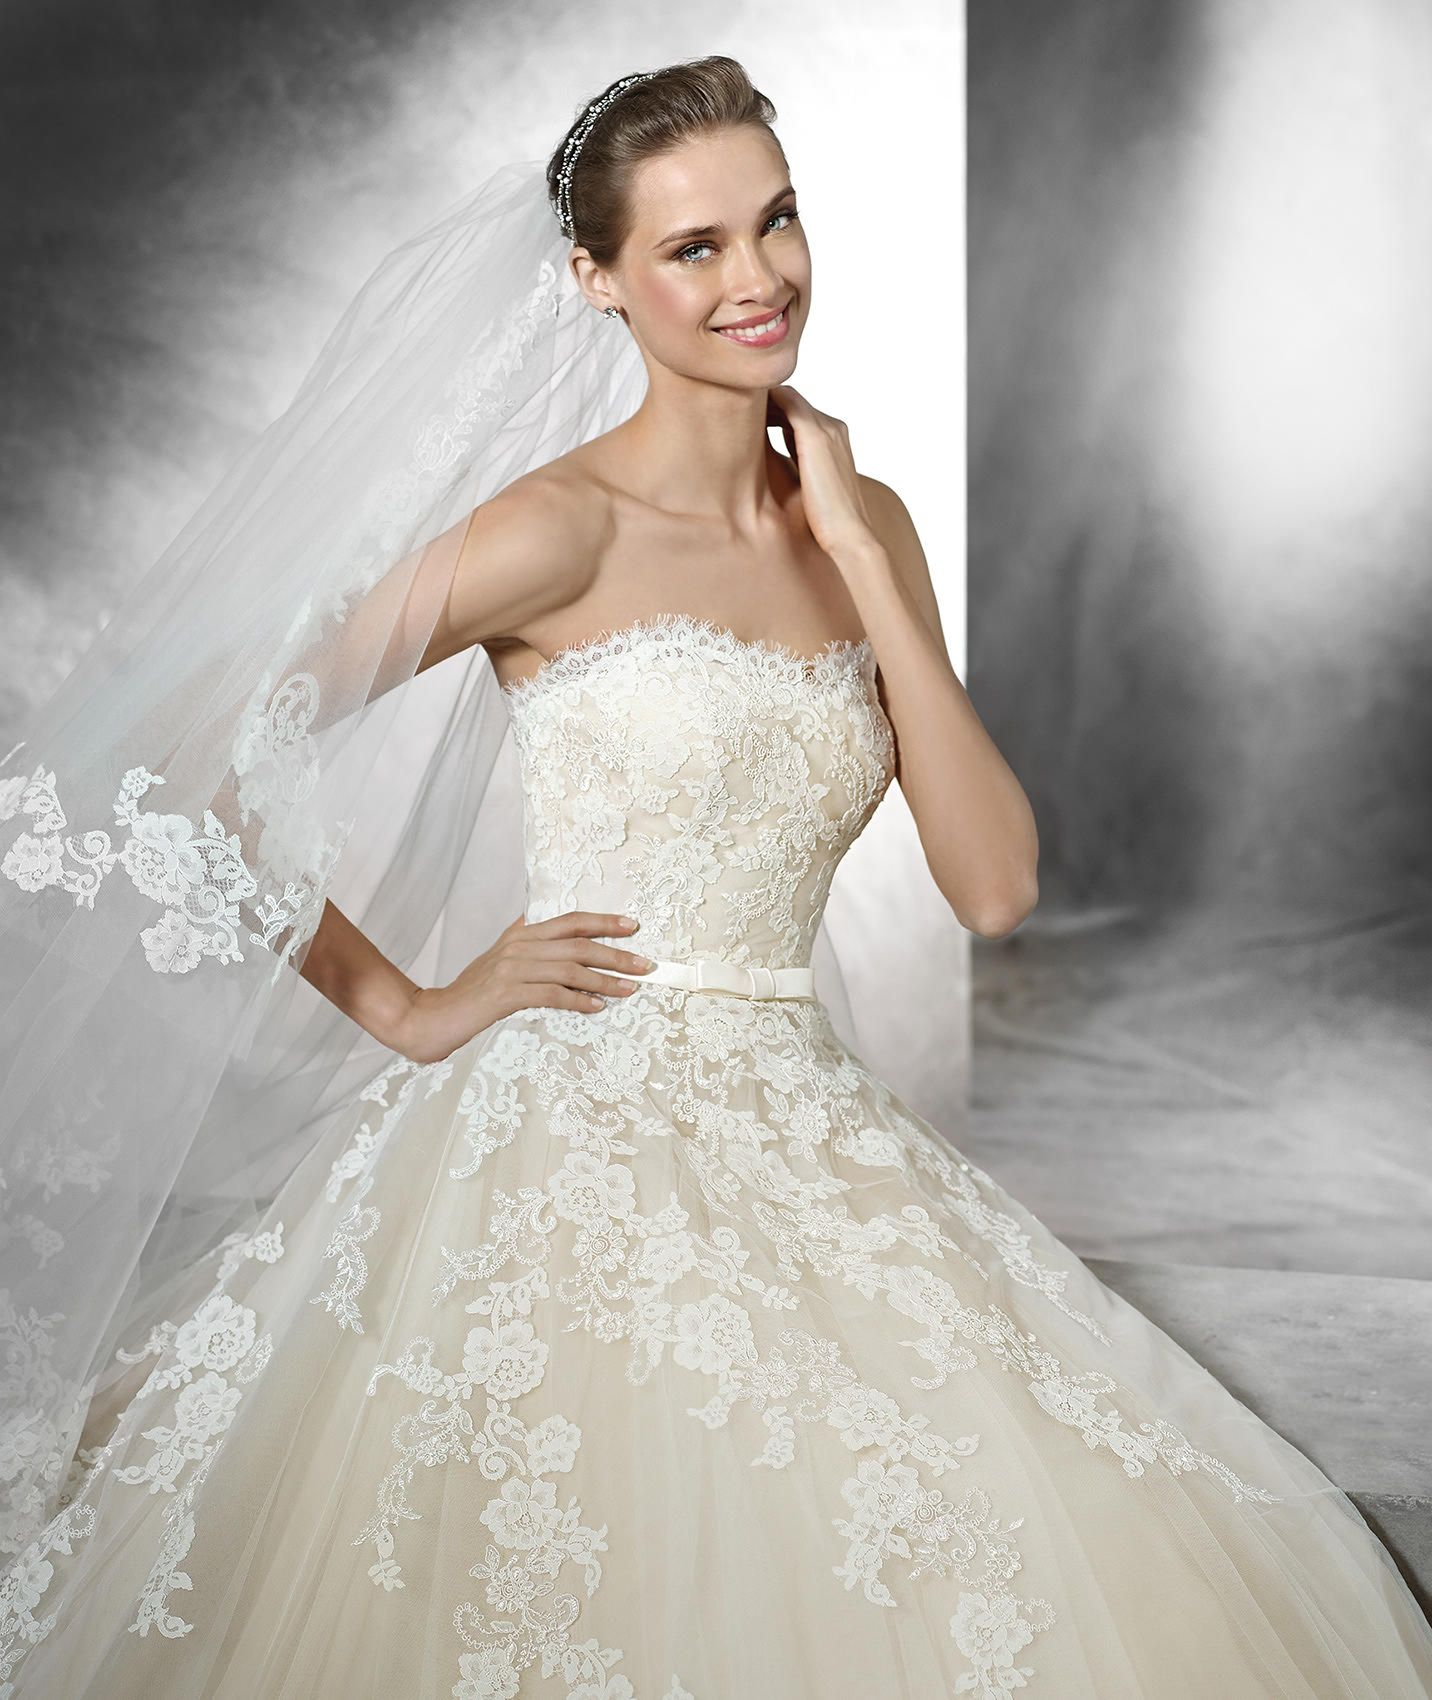 TREY - Princess wedding dress with sweetheart neckline | Pronovias ...